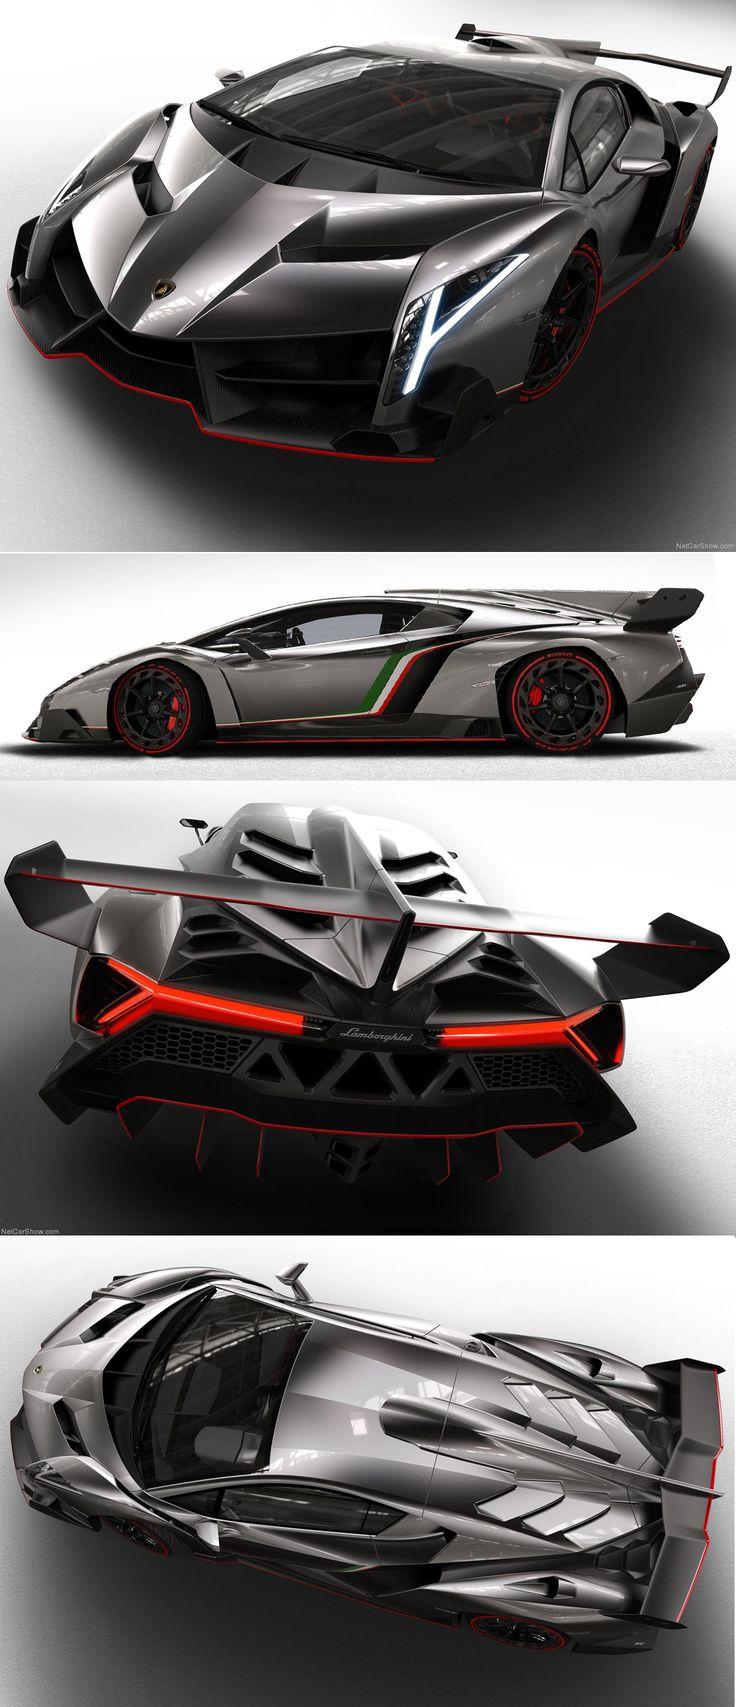 Lamborghini veneno car of my dreams unless i m dreaming of living on